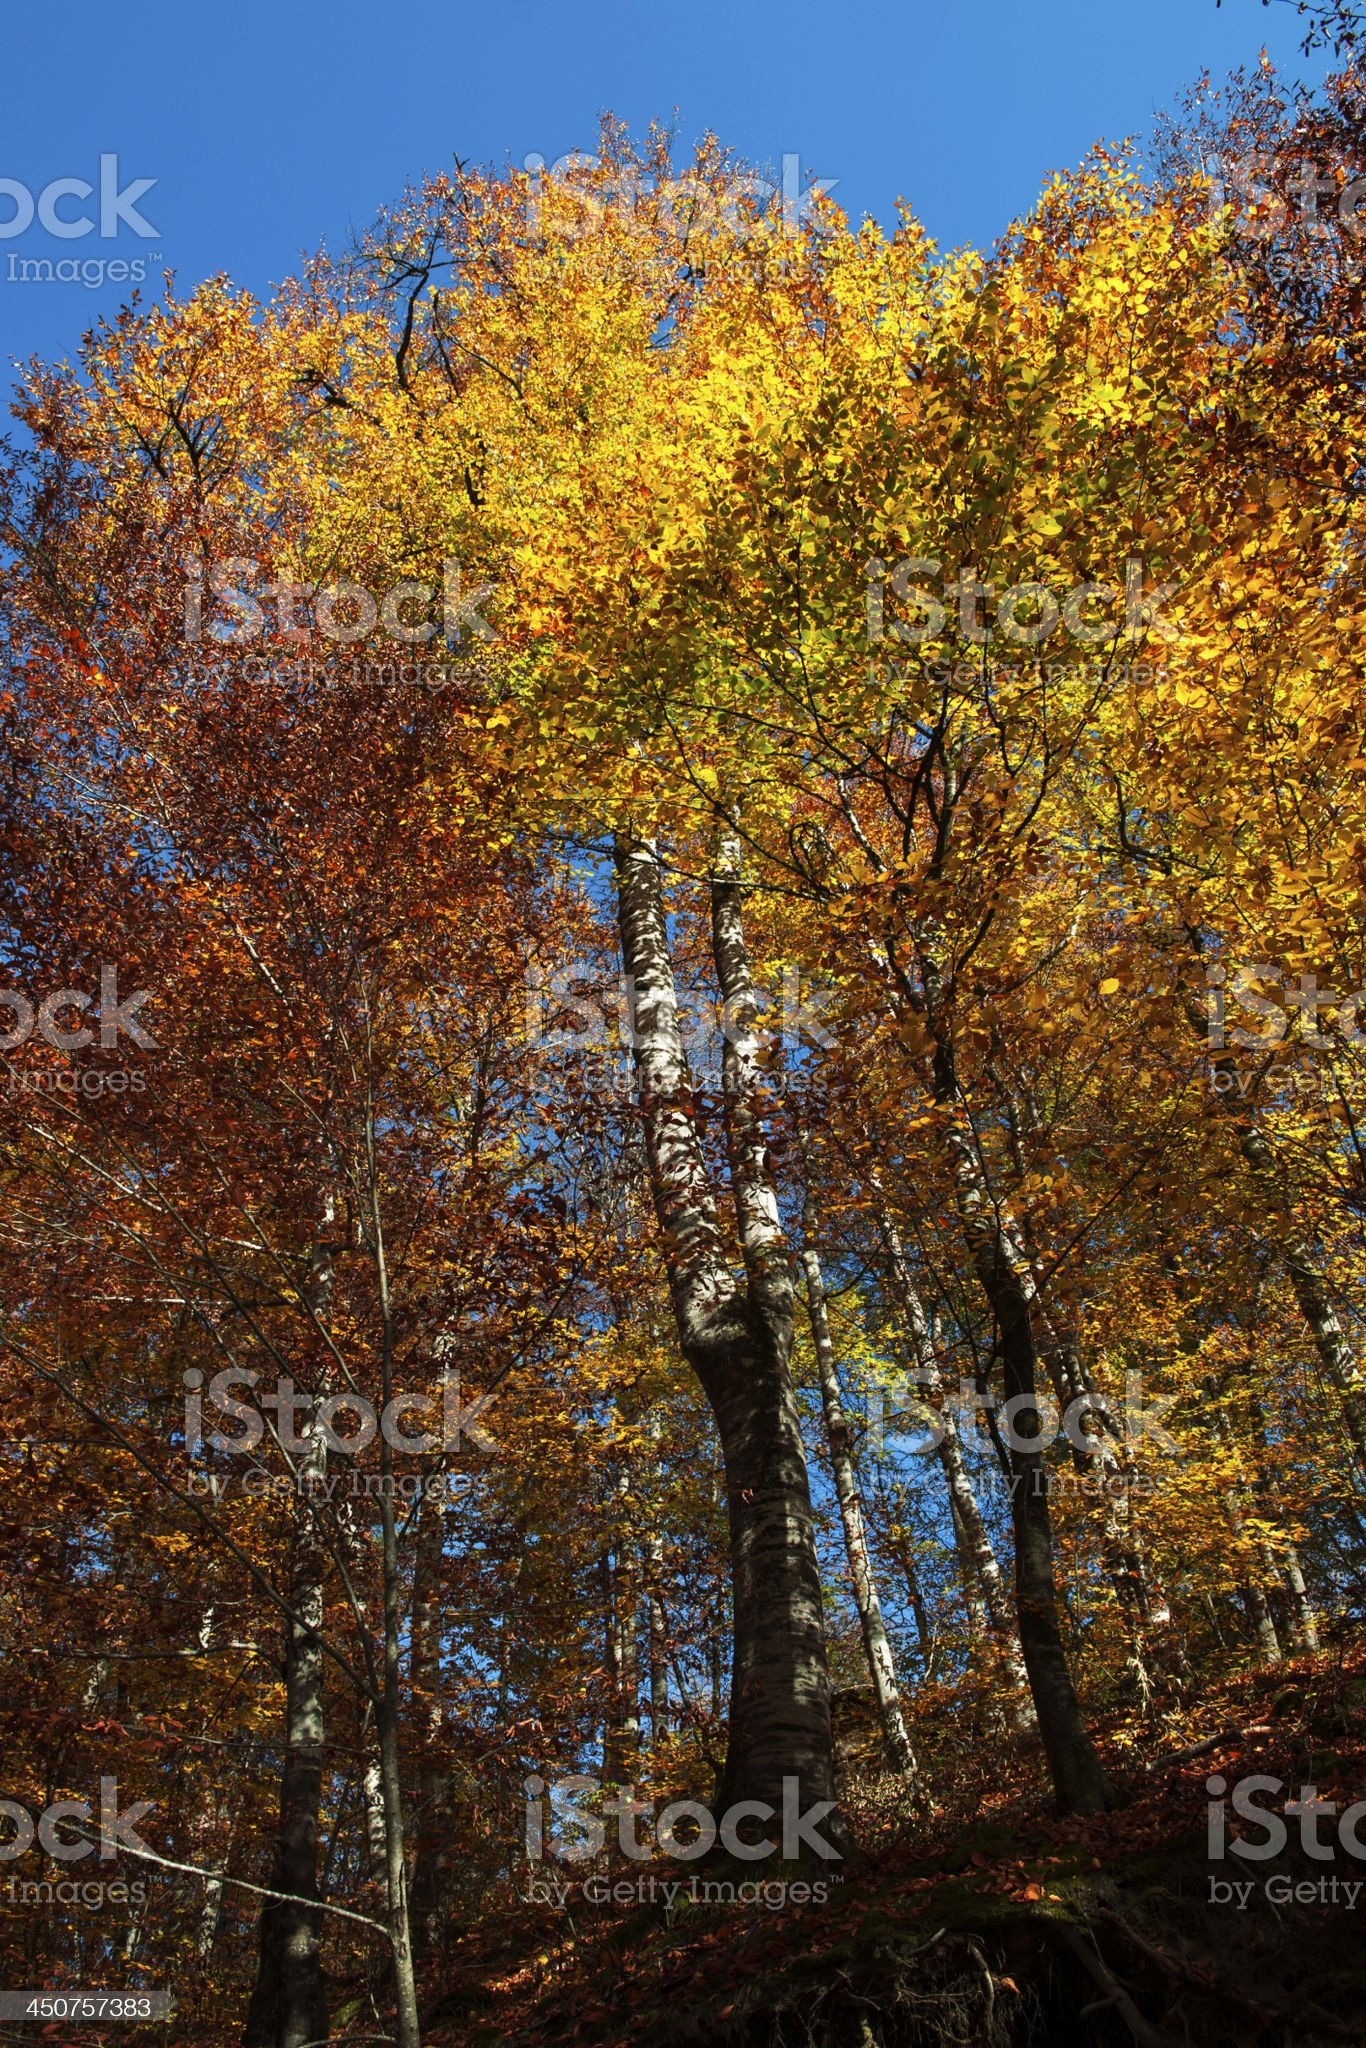 Autumn Tree Looking Up royalty-free stock photo